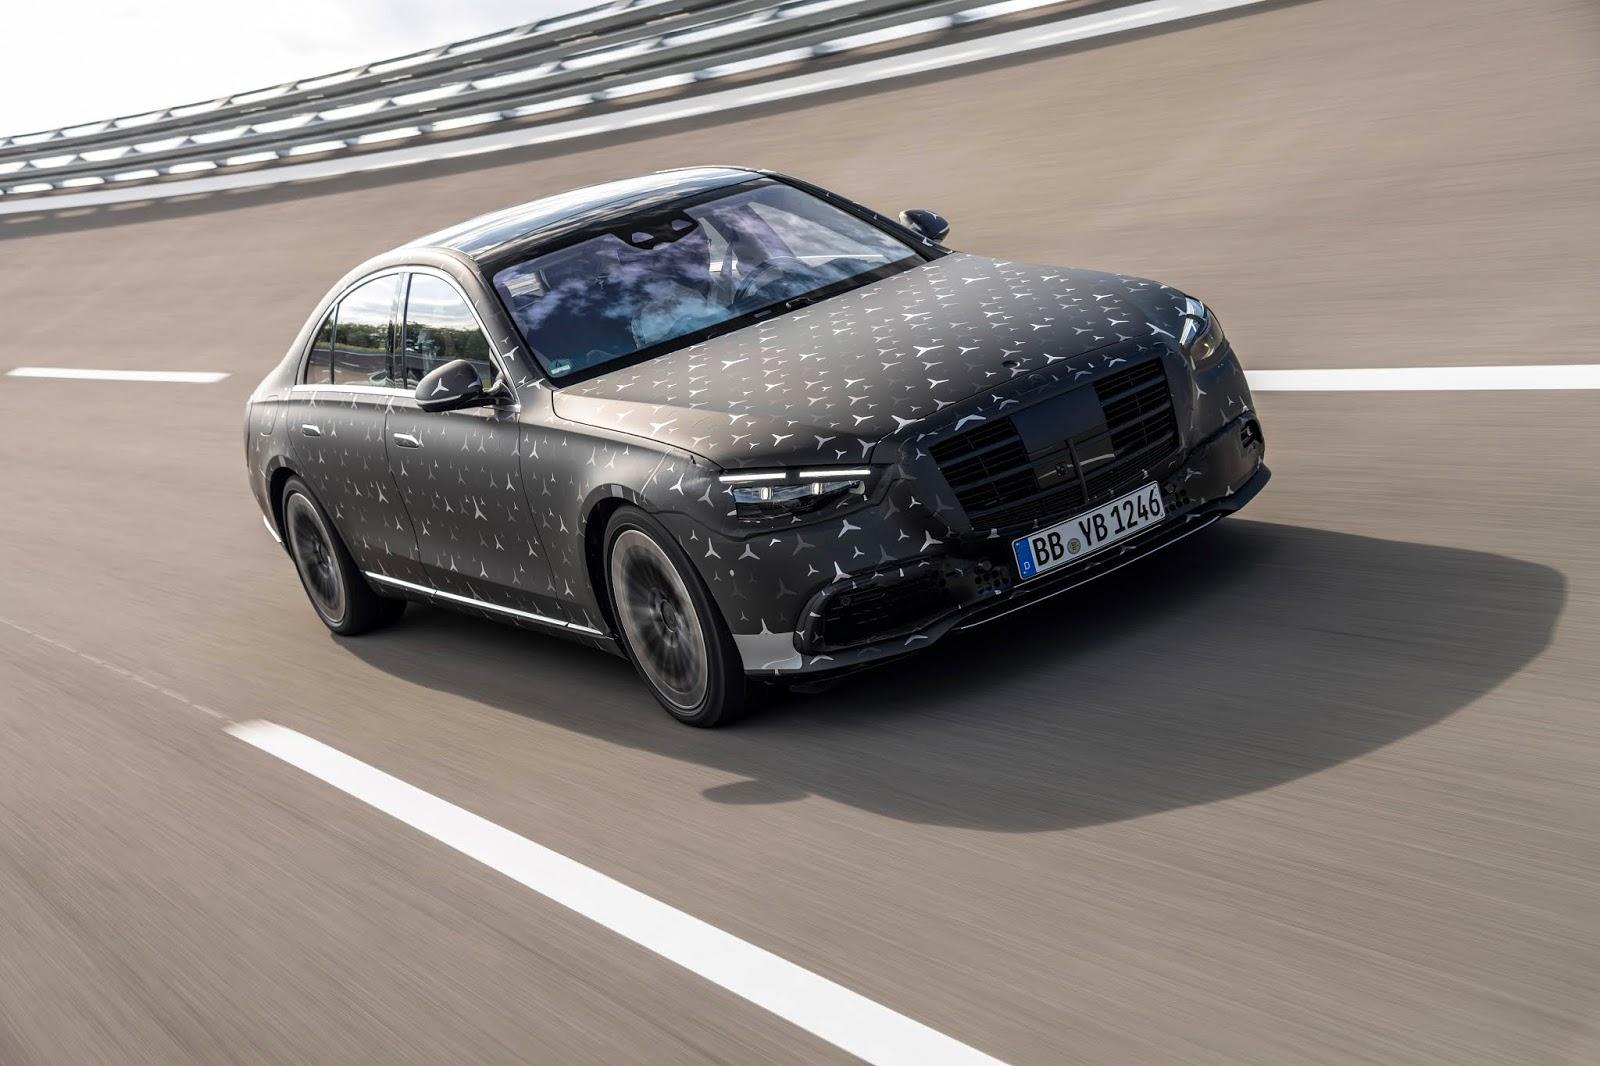 2020 07 13 Image 20C0377 015 Οι τεχνολογίες της νέας Mercedes-Benz S-Class